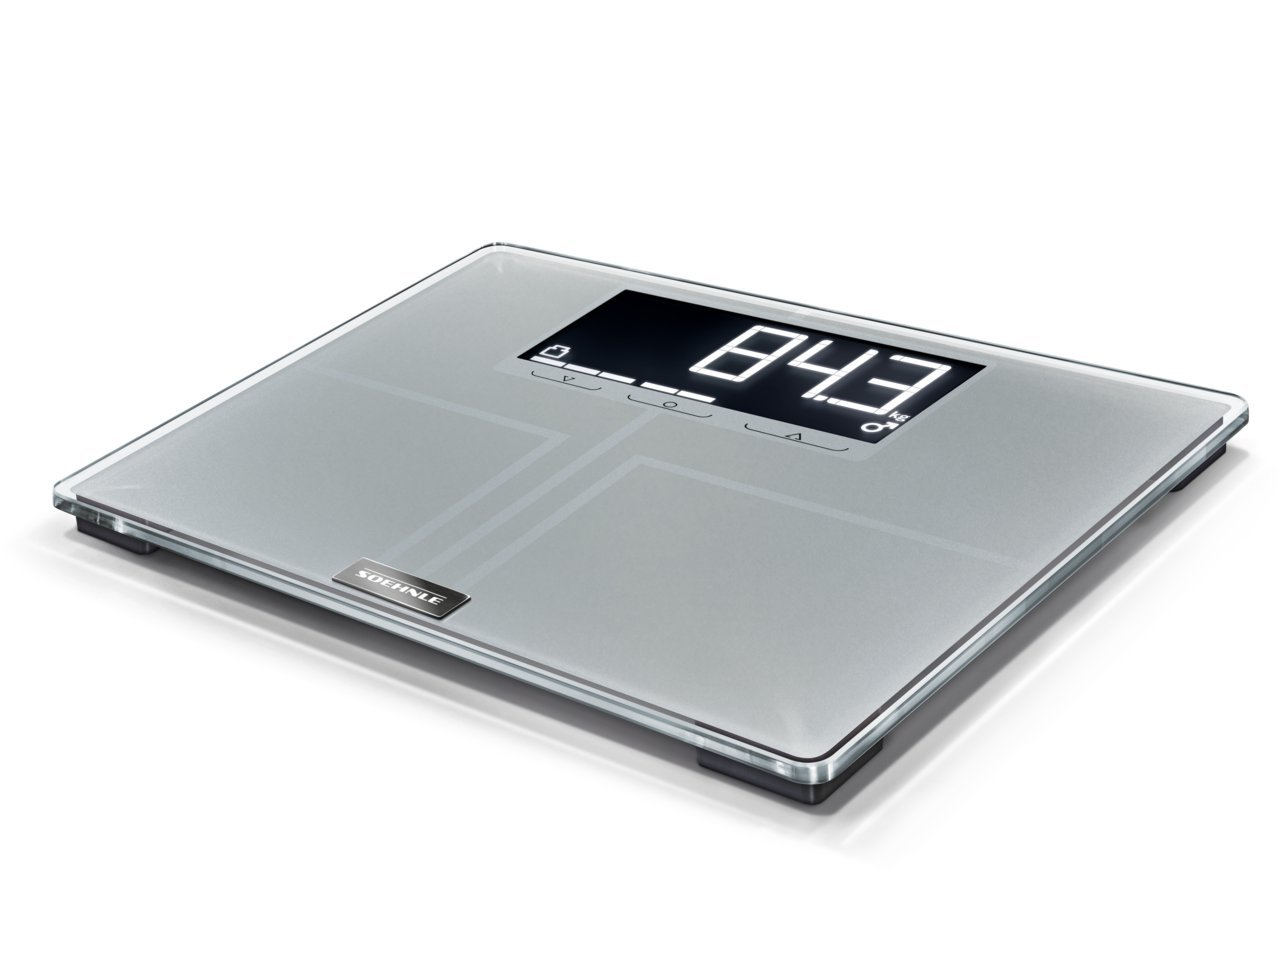 Soehnle 63869 Pesa Persona Elettronica di Analisi Corporea Shape Sense Profi 300 200 kg Leifheit